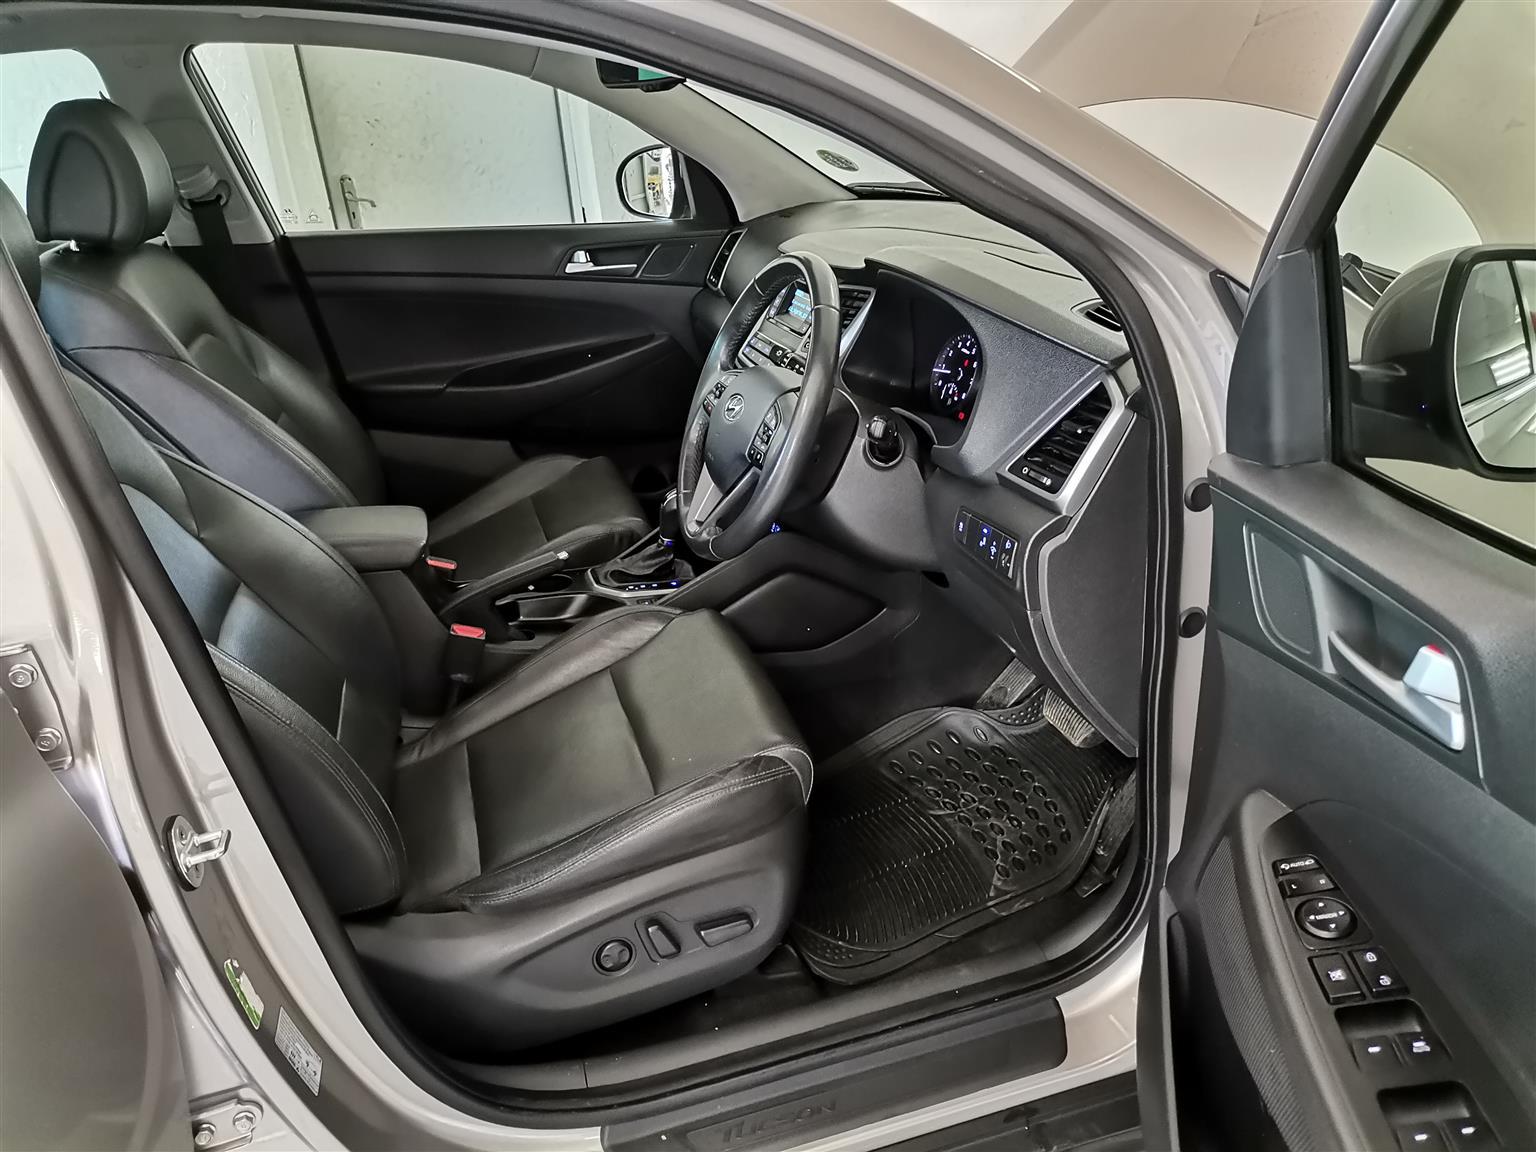 2017 HYUNDAI TUCSON 1.6TGDi 4WD Elite Auto 49,000KM R320,00 Mechanically perfect